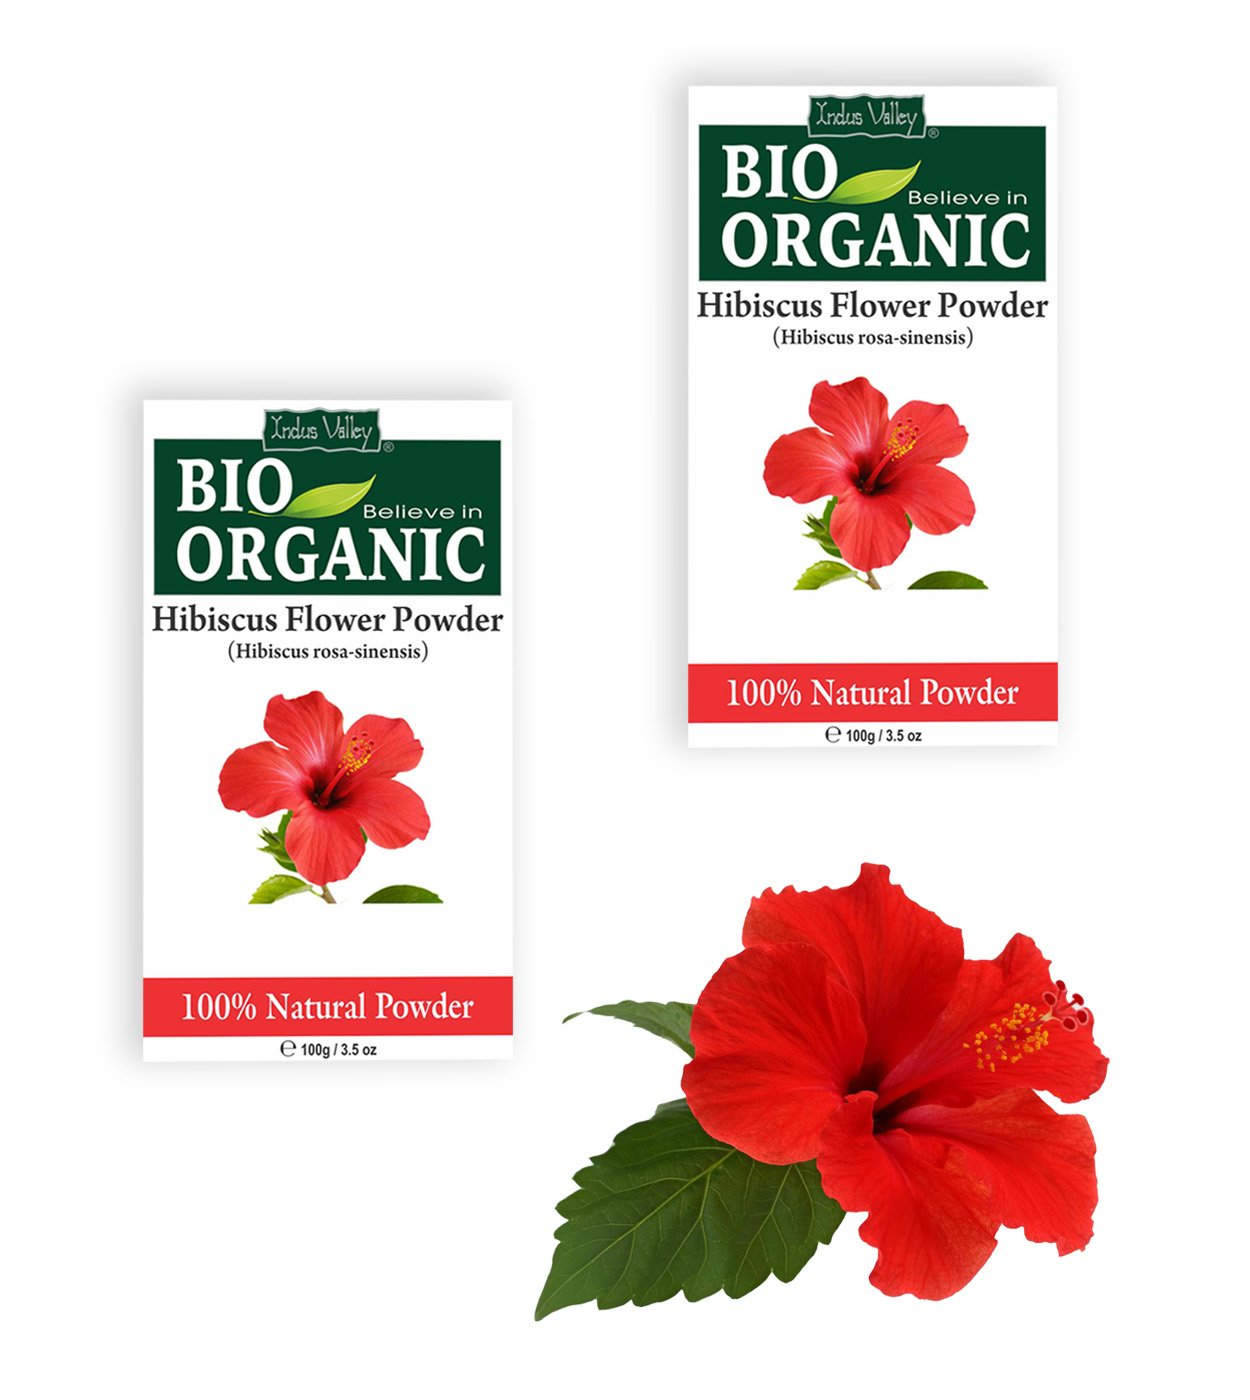 Indus valley organic hibiscus powder 200 grams amazon beauty izmirmasajfo